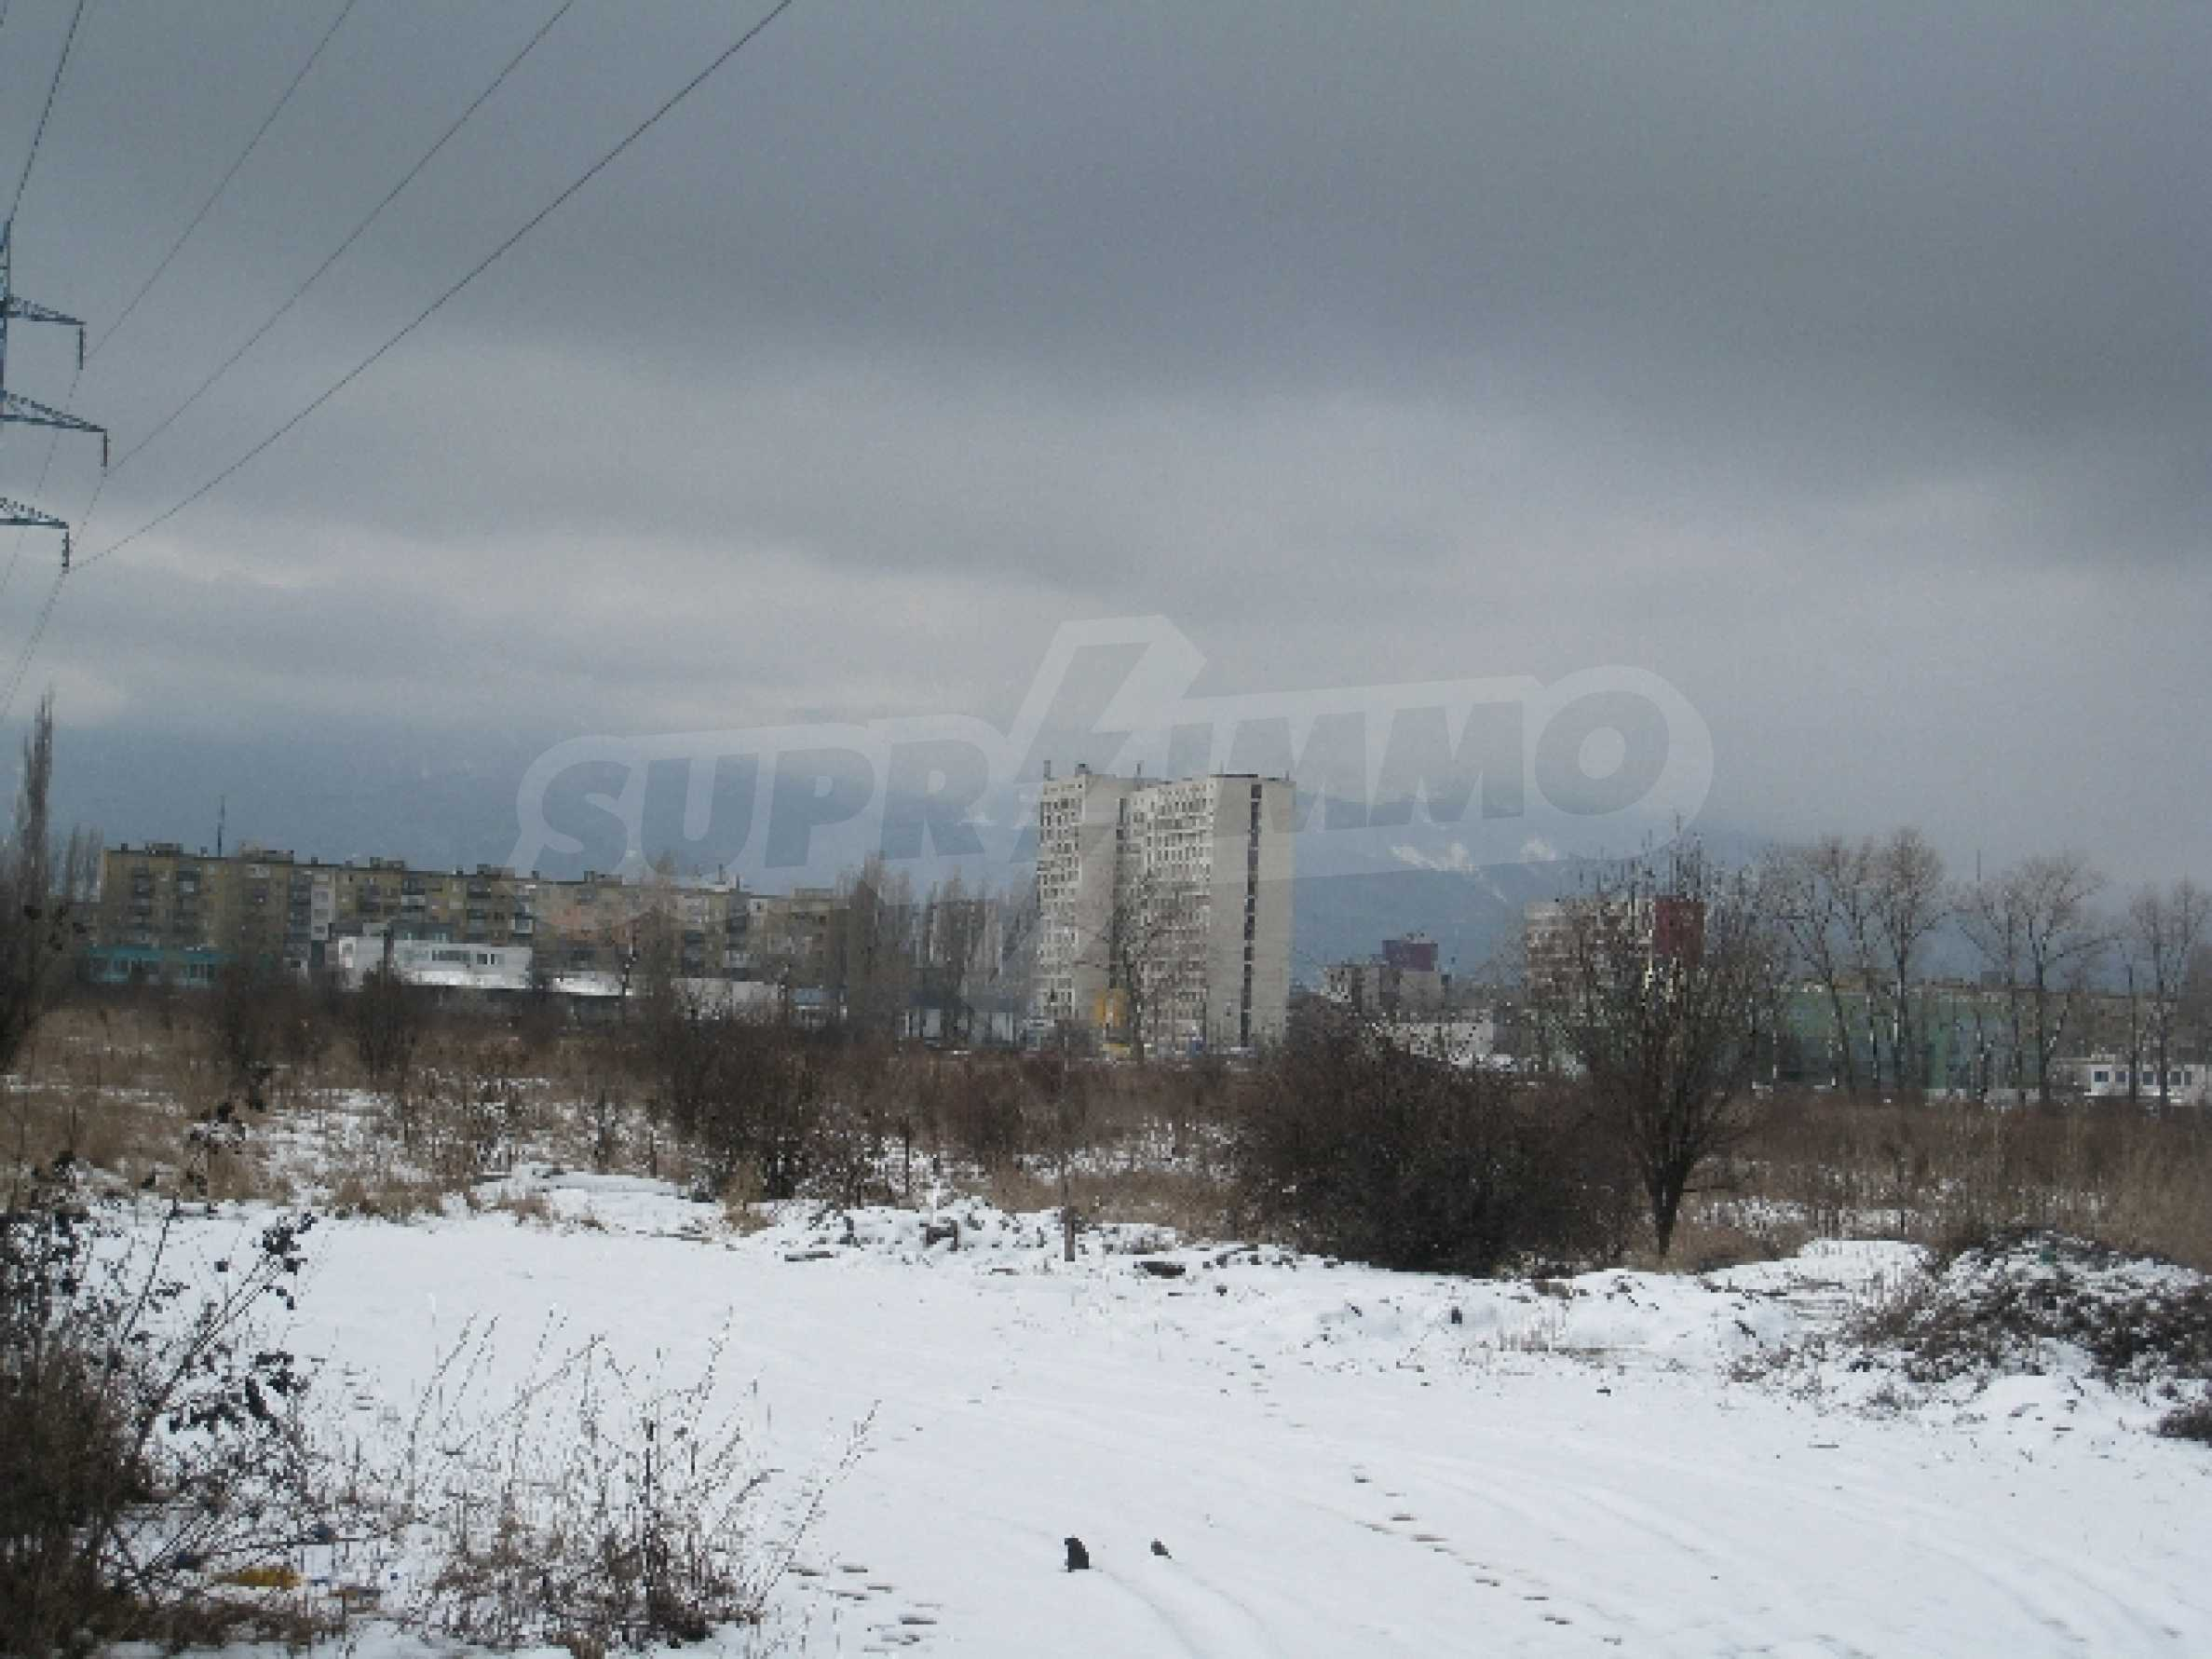 Development land near the Airport 9